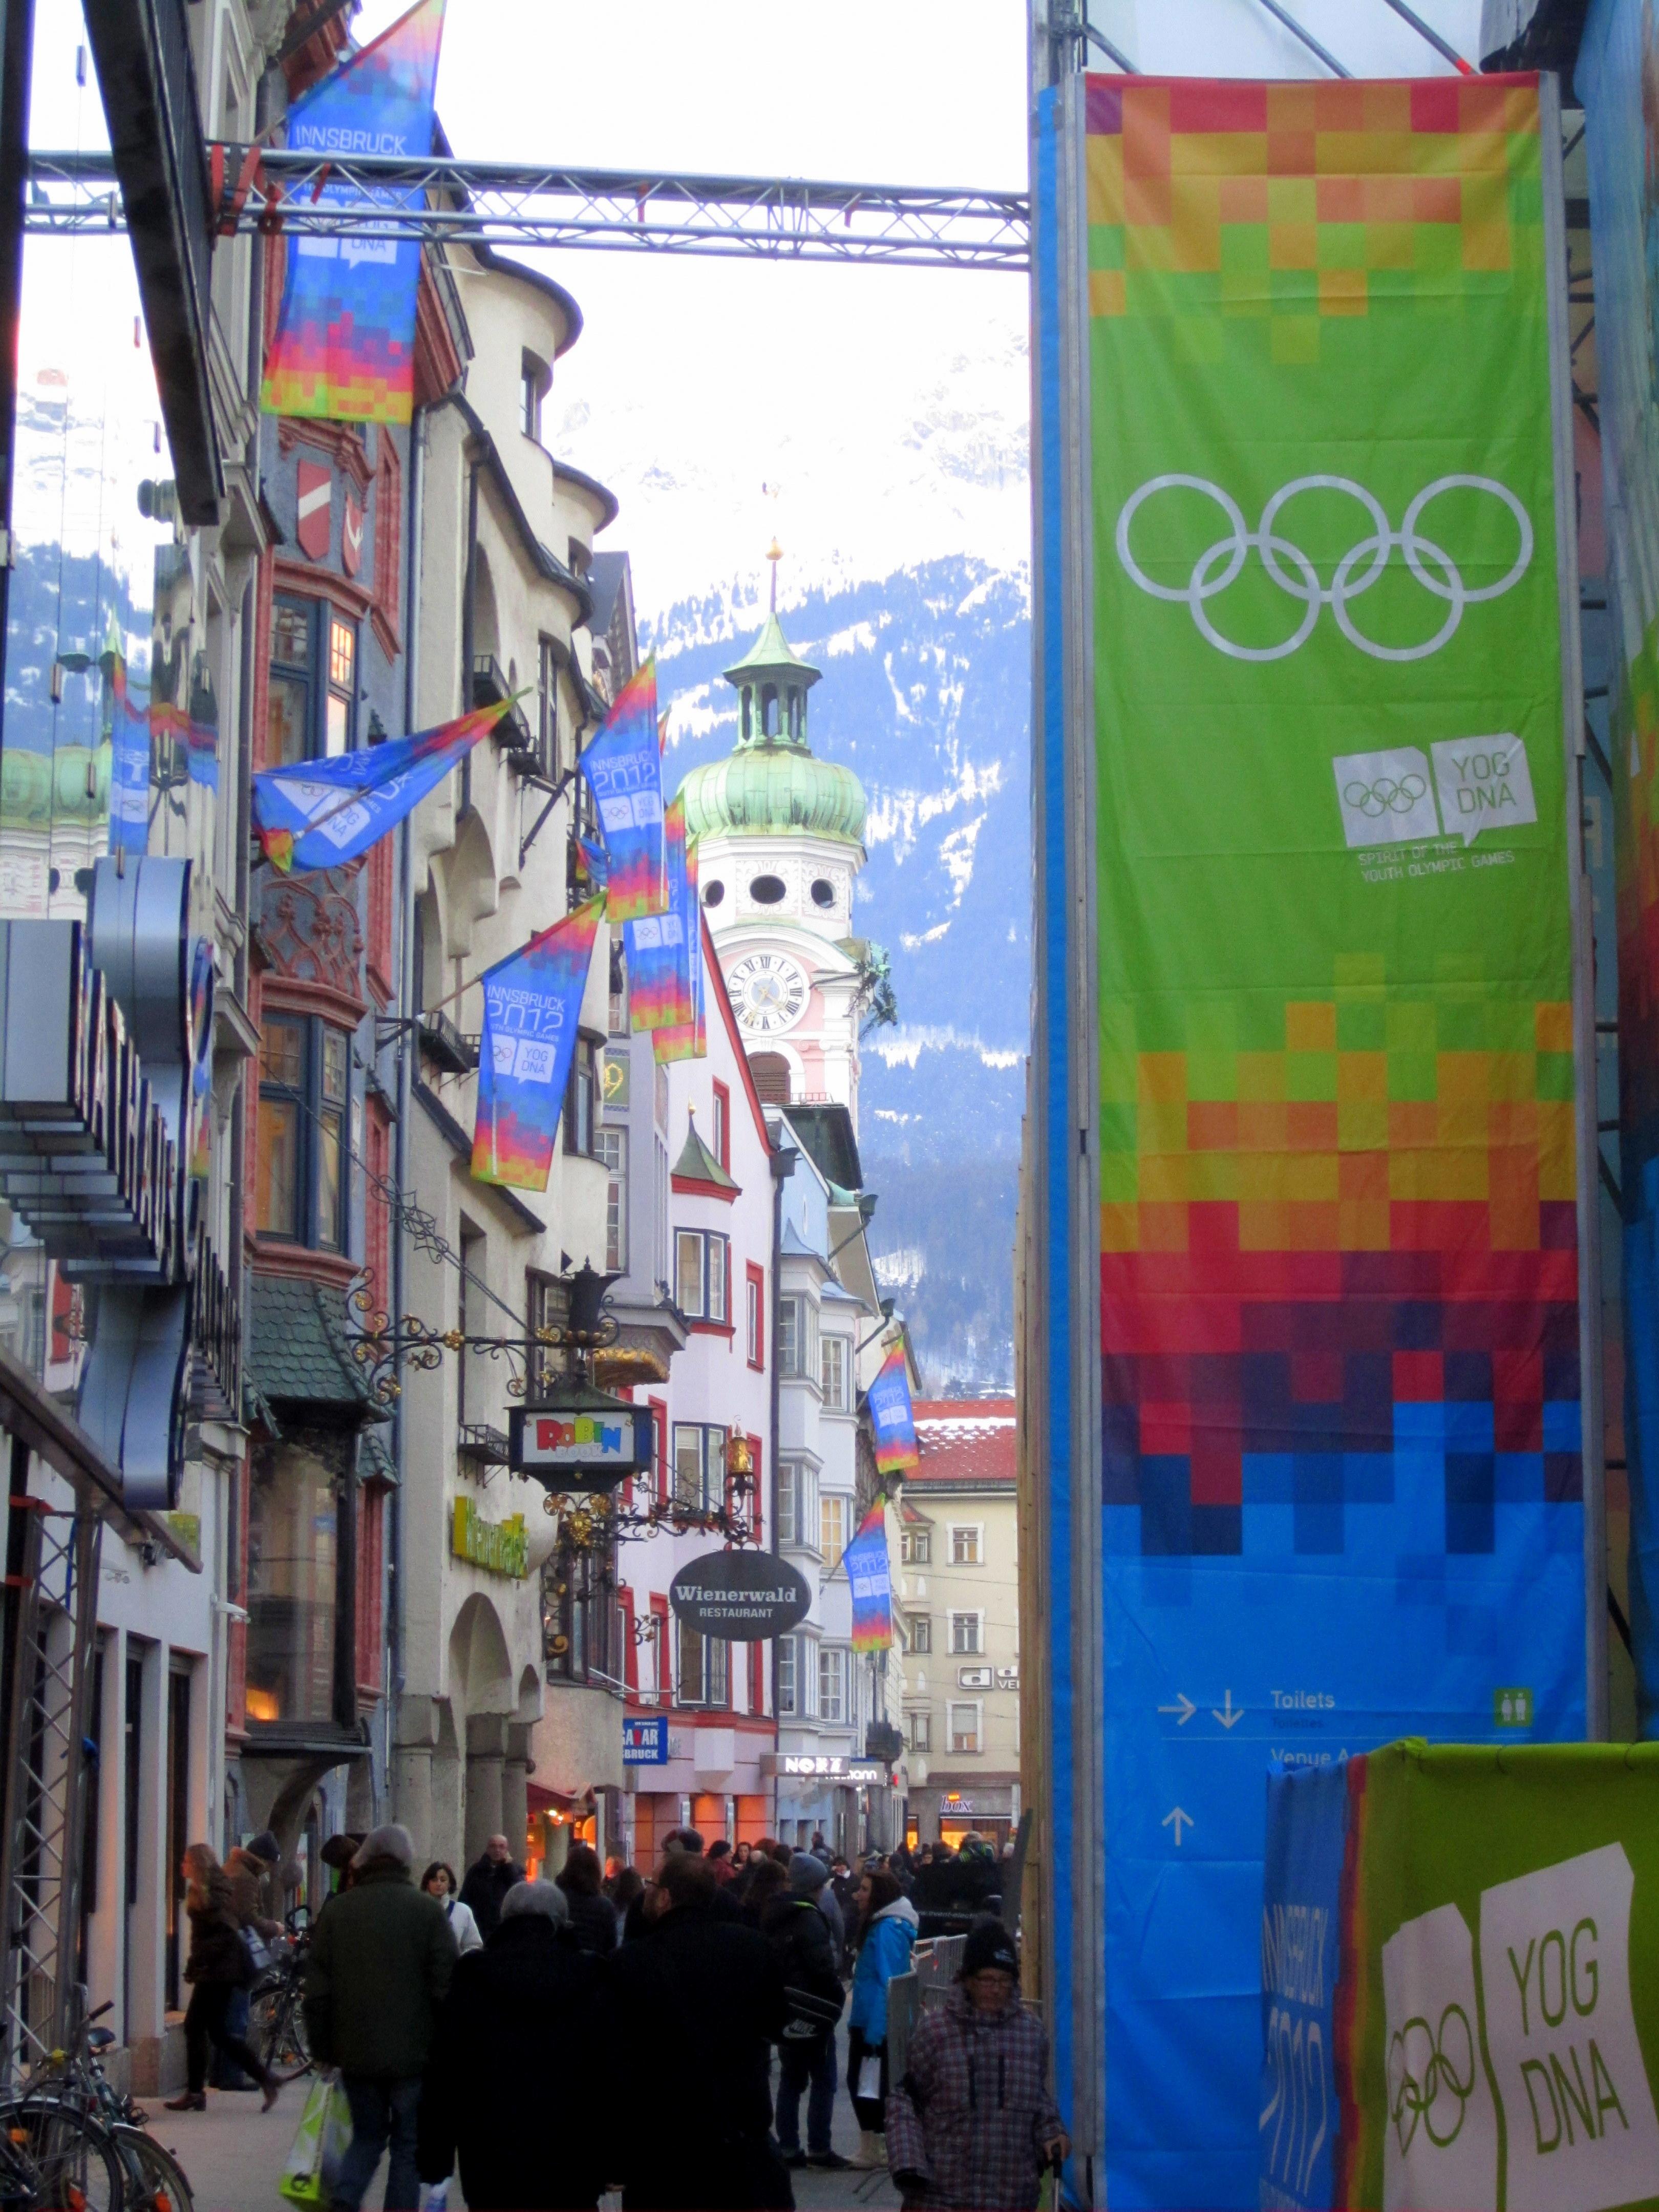 https://fasterskier.com/wp-content/blogs.dir/1/files/2012/01/Maria-Theresien-Strasse-Innsbruck.jpg